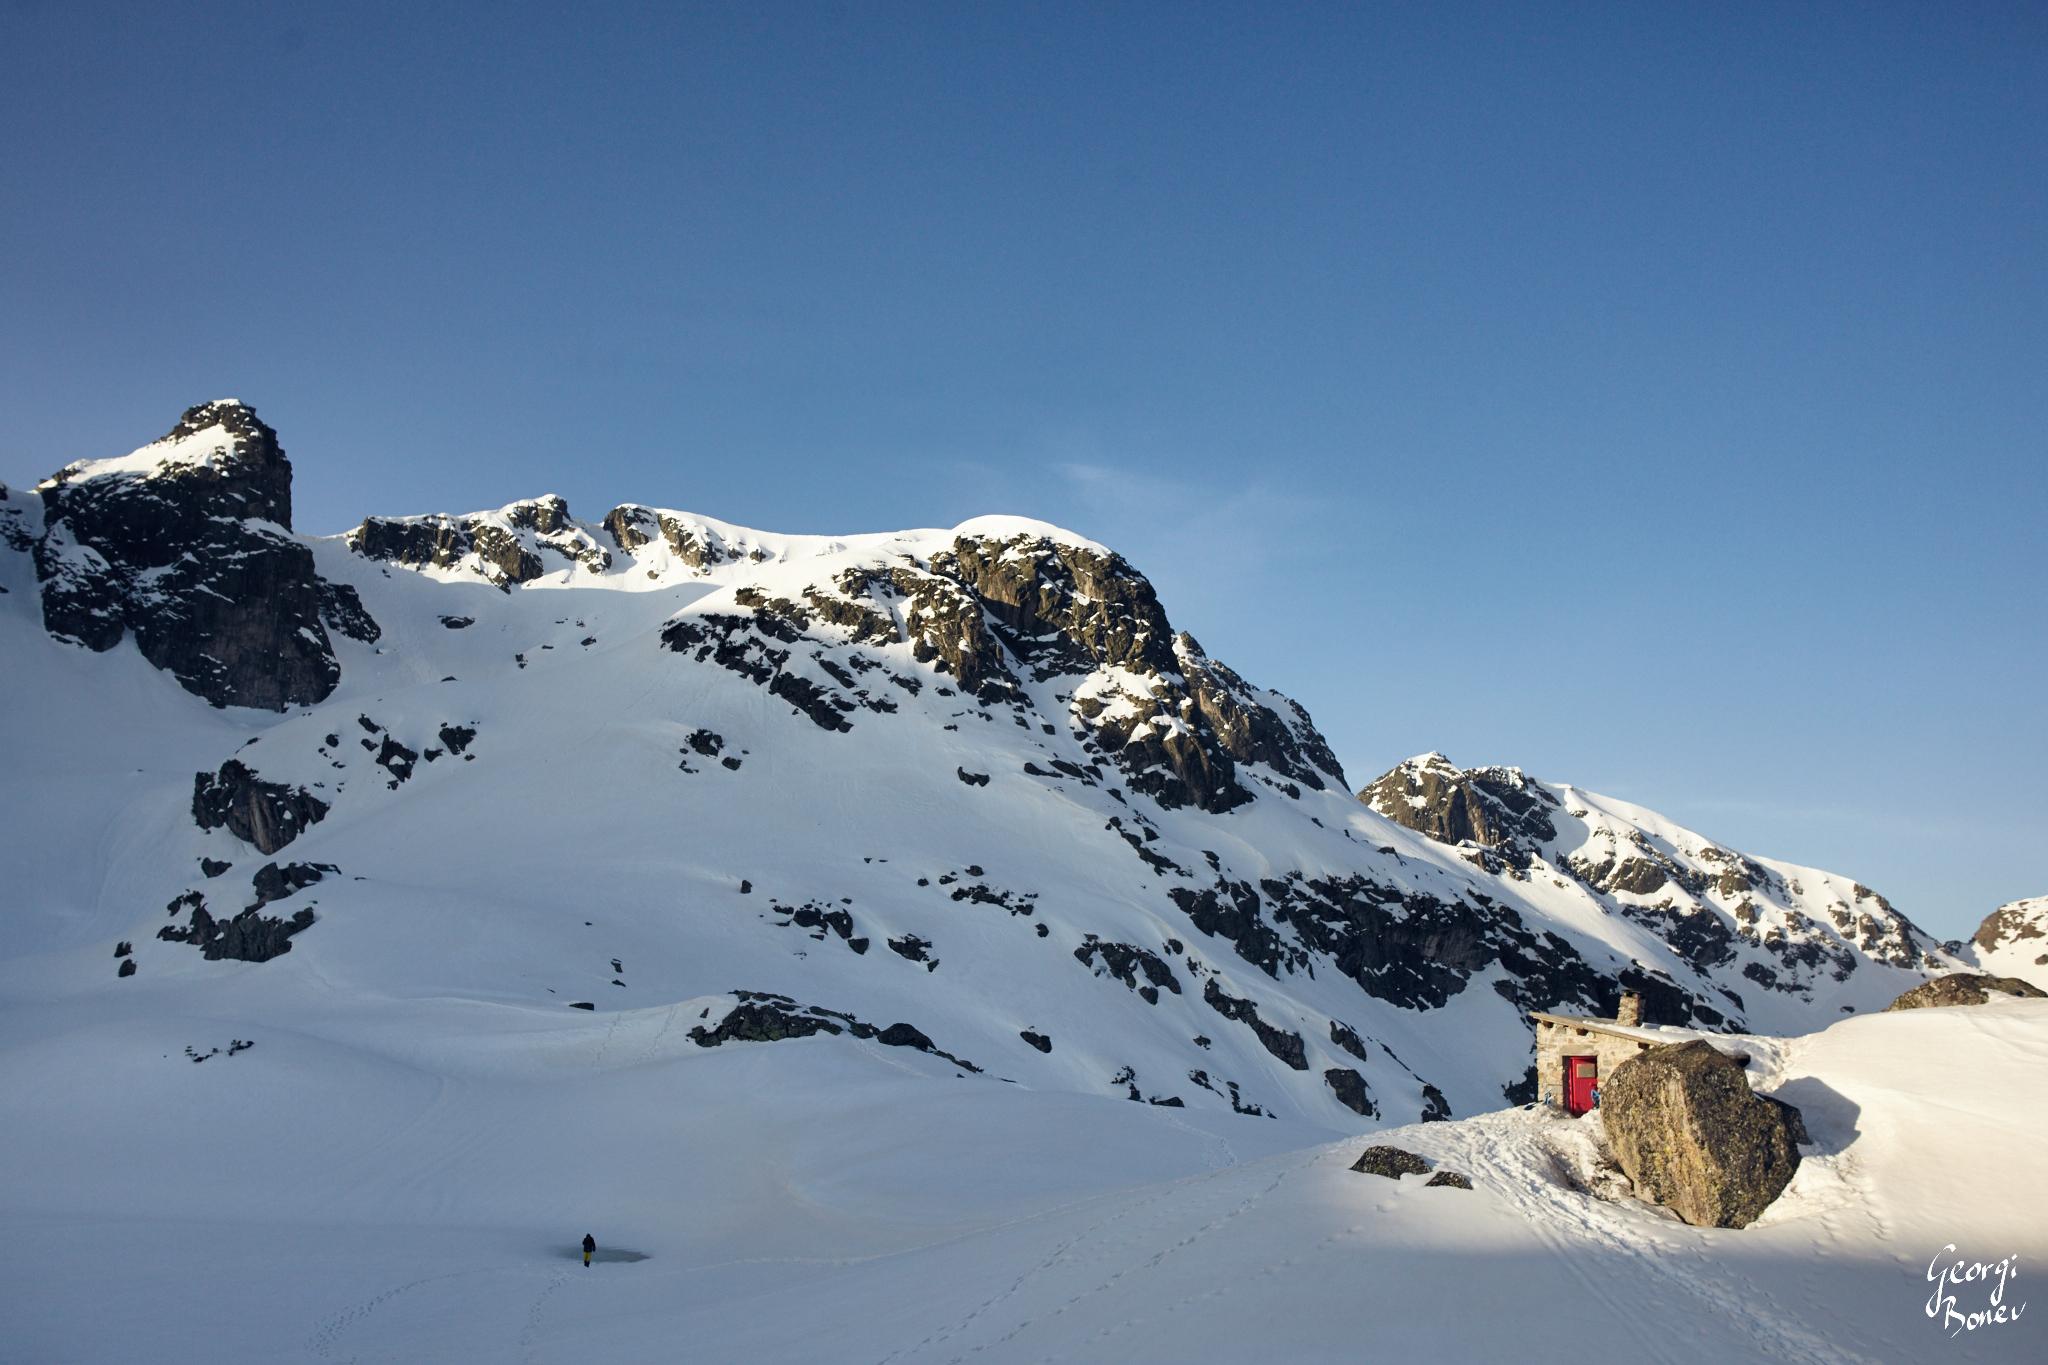 Winter View of Strashno Ezero Shelter in Rila Mountain